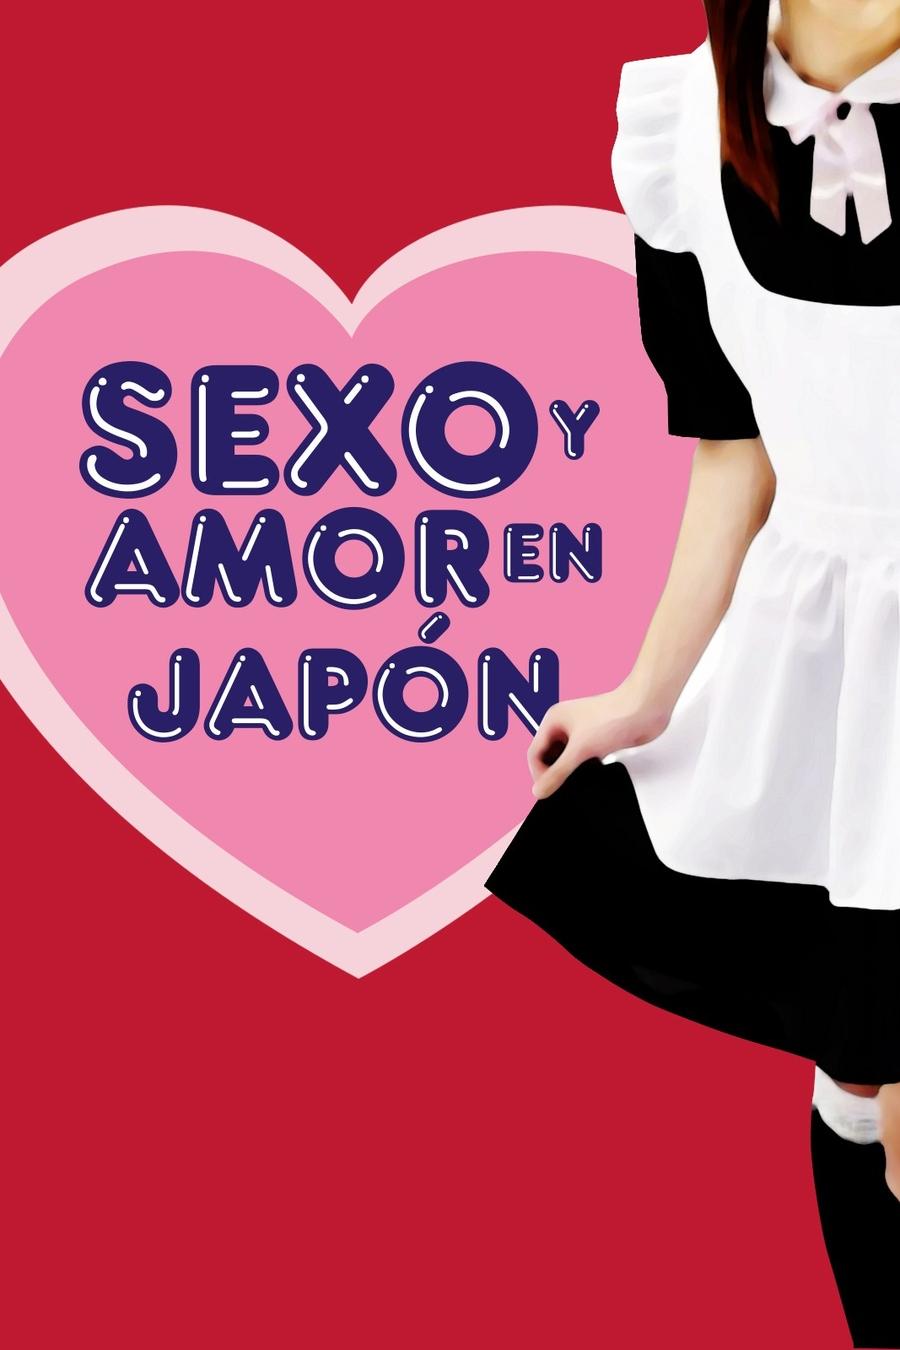 Sexe i amor al Japó